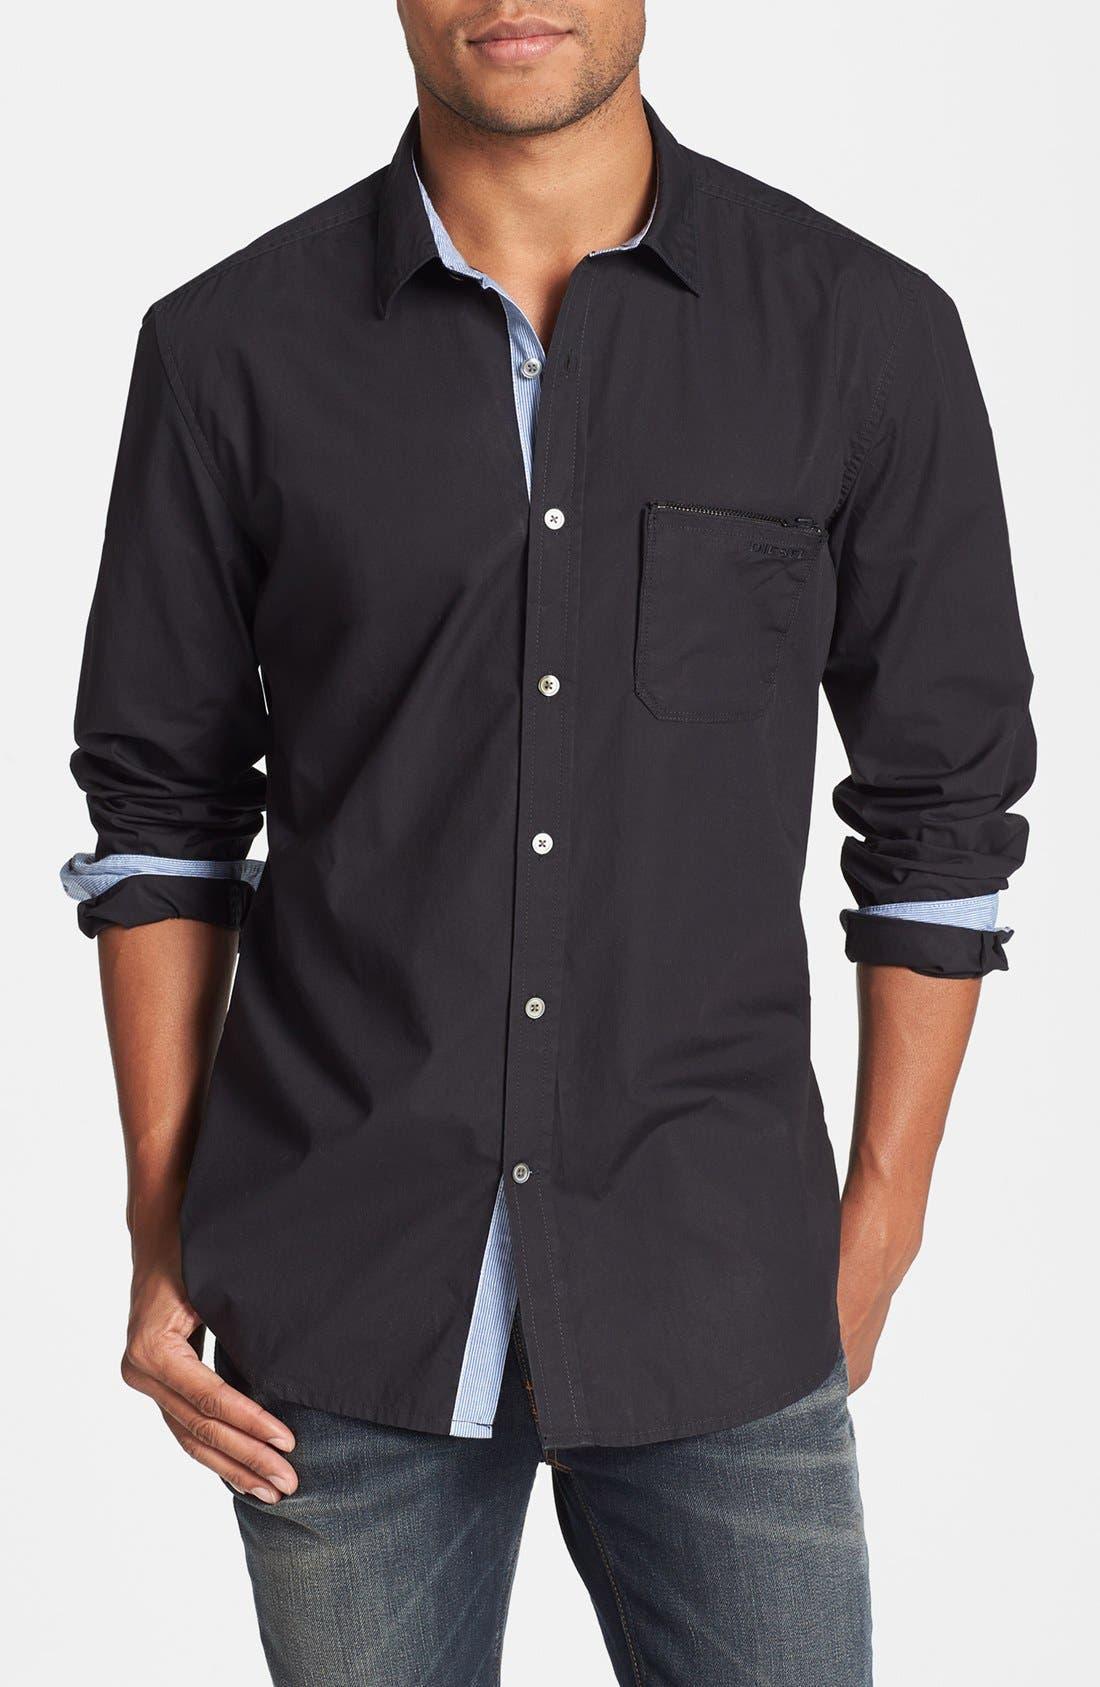 Alternate Image 1 Selected - DIESEL® 'Mirtilla' Long Sleeve Sport Shirt